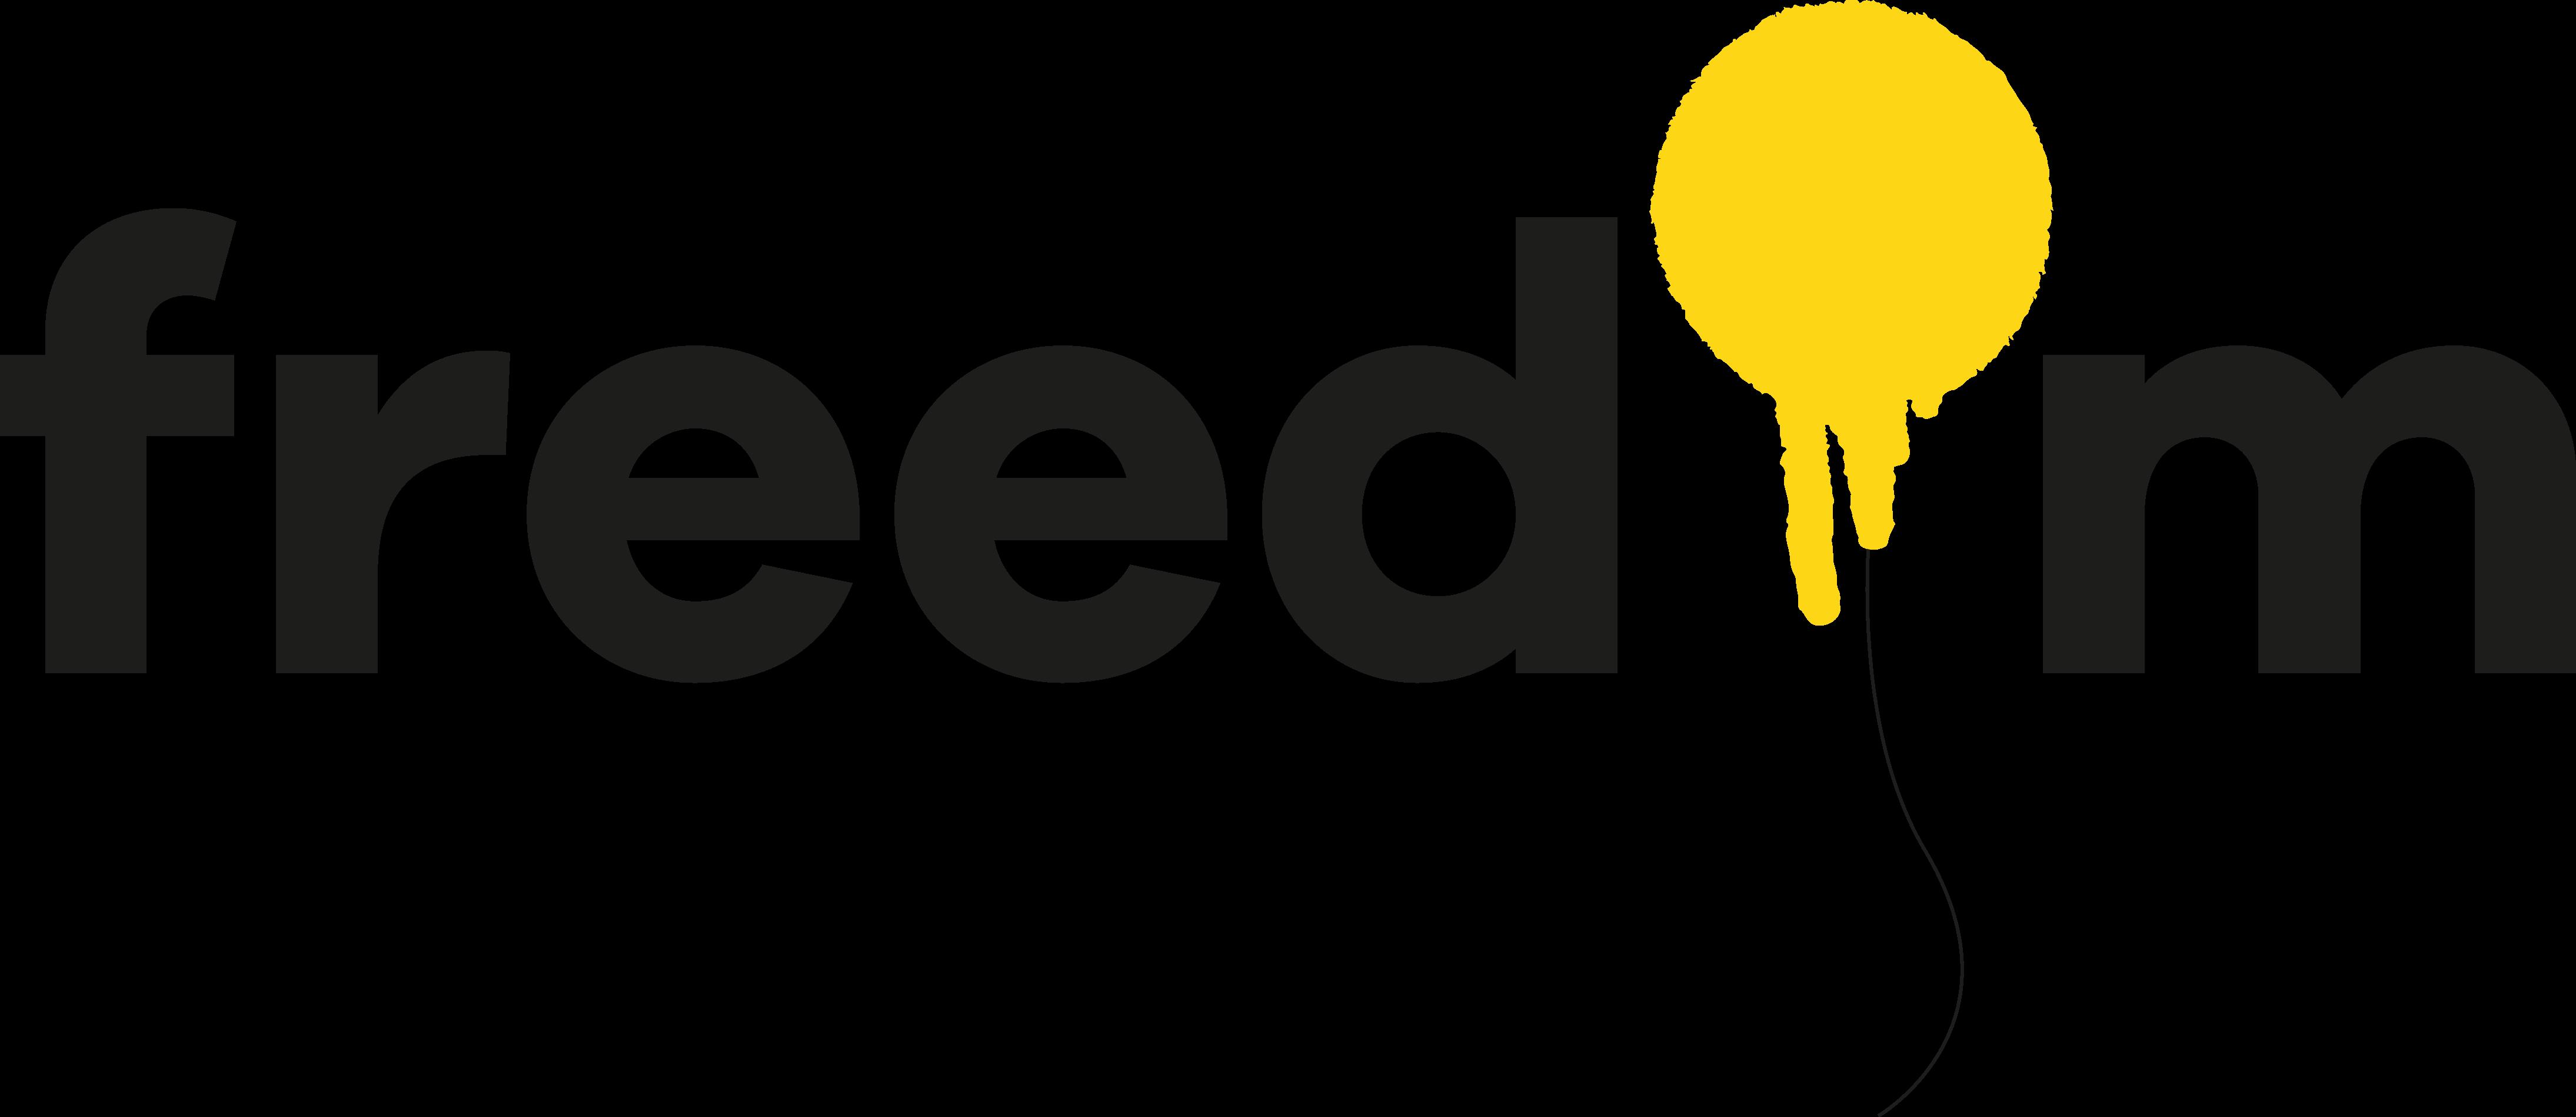 freedomnet/logo.png